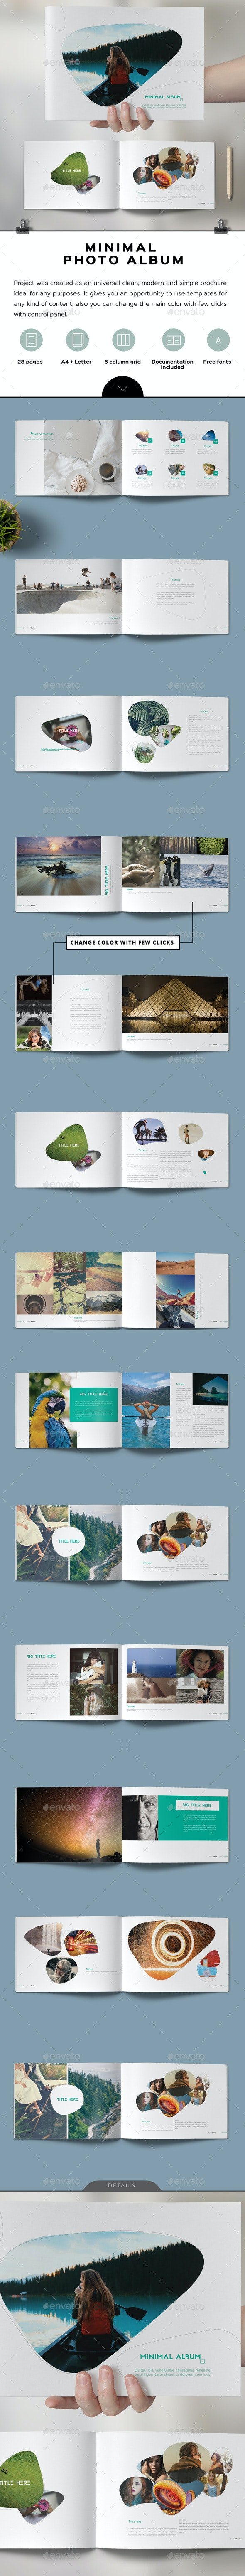 Minimal Photo Album - Photo Albums Print Templates